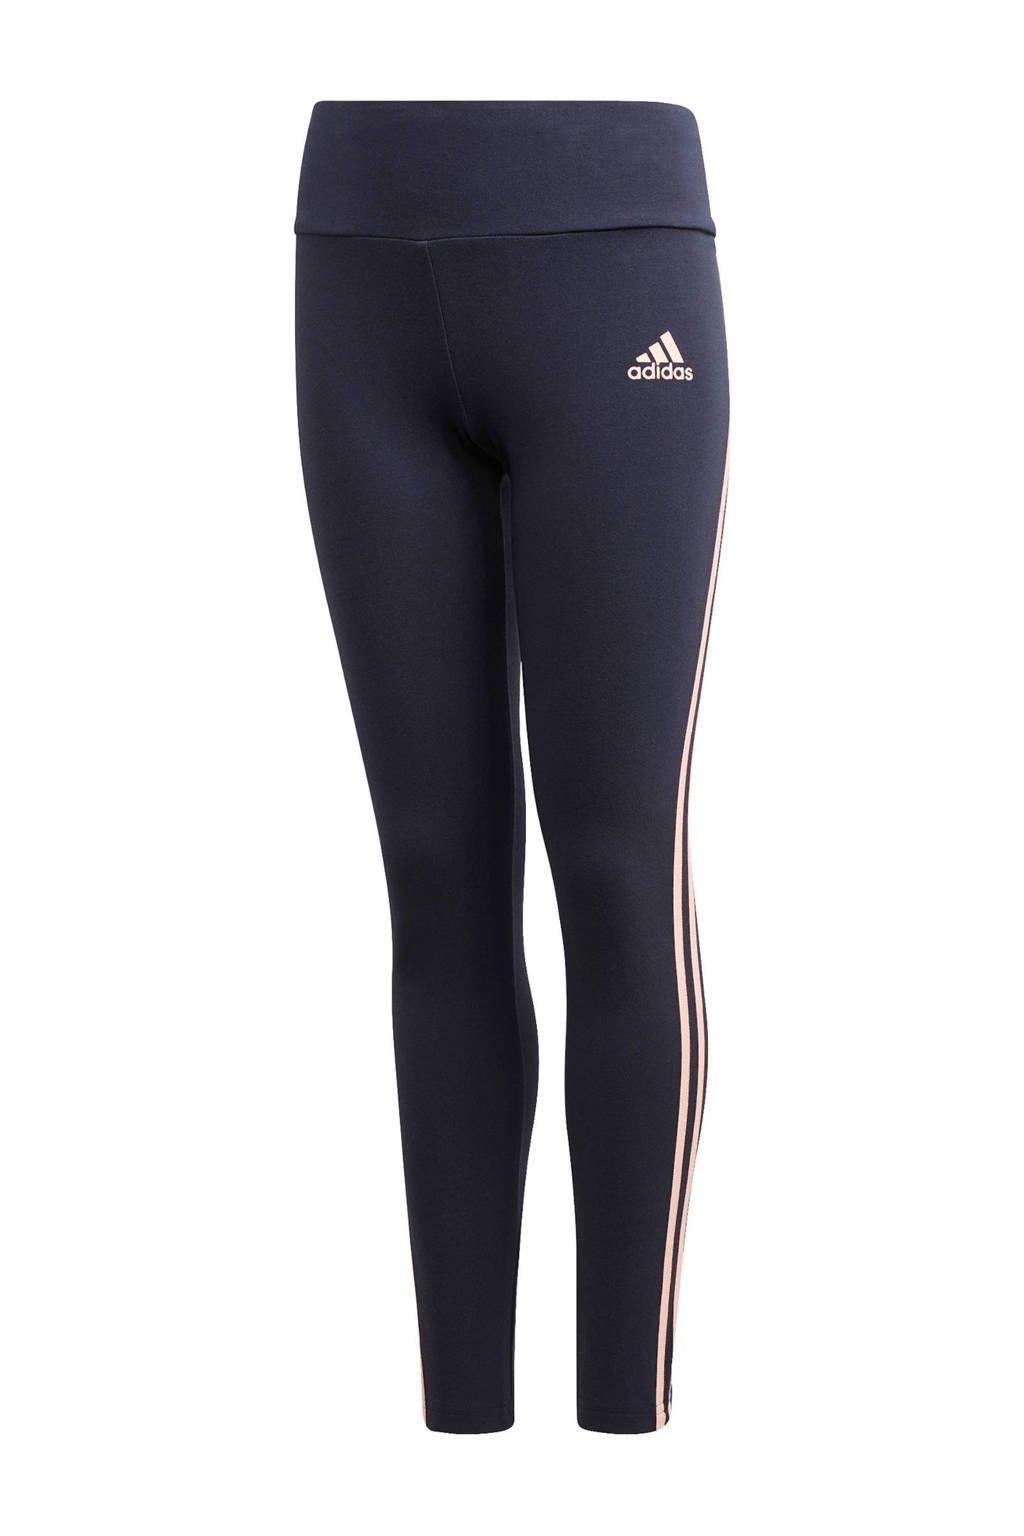 adidas Performance sportbroek donkerblauw/lichtroze, Donkerblauw/lichtroze